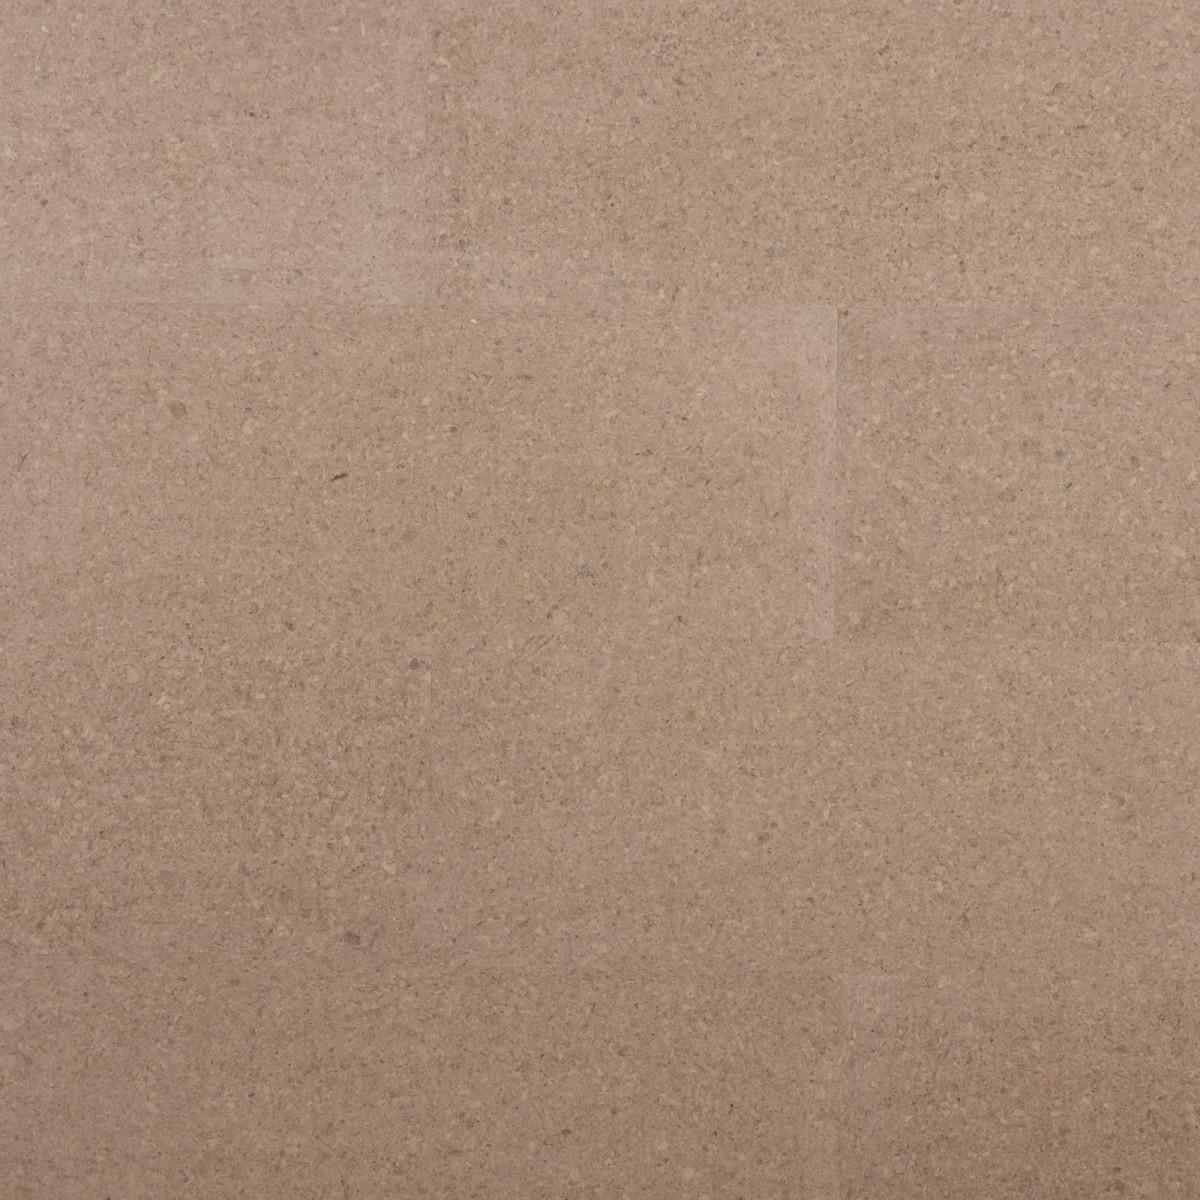 Пробковая доска Дубай 2.23 м²